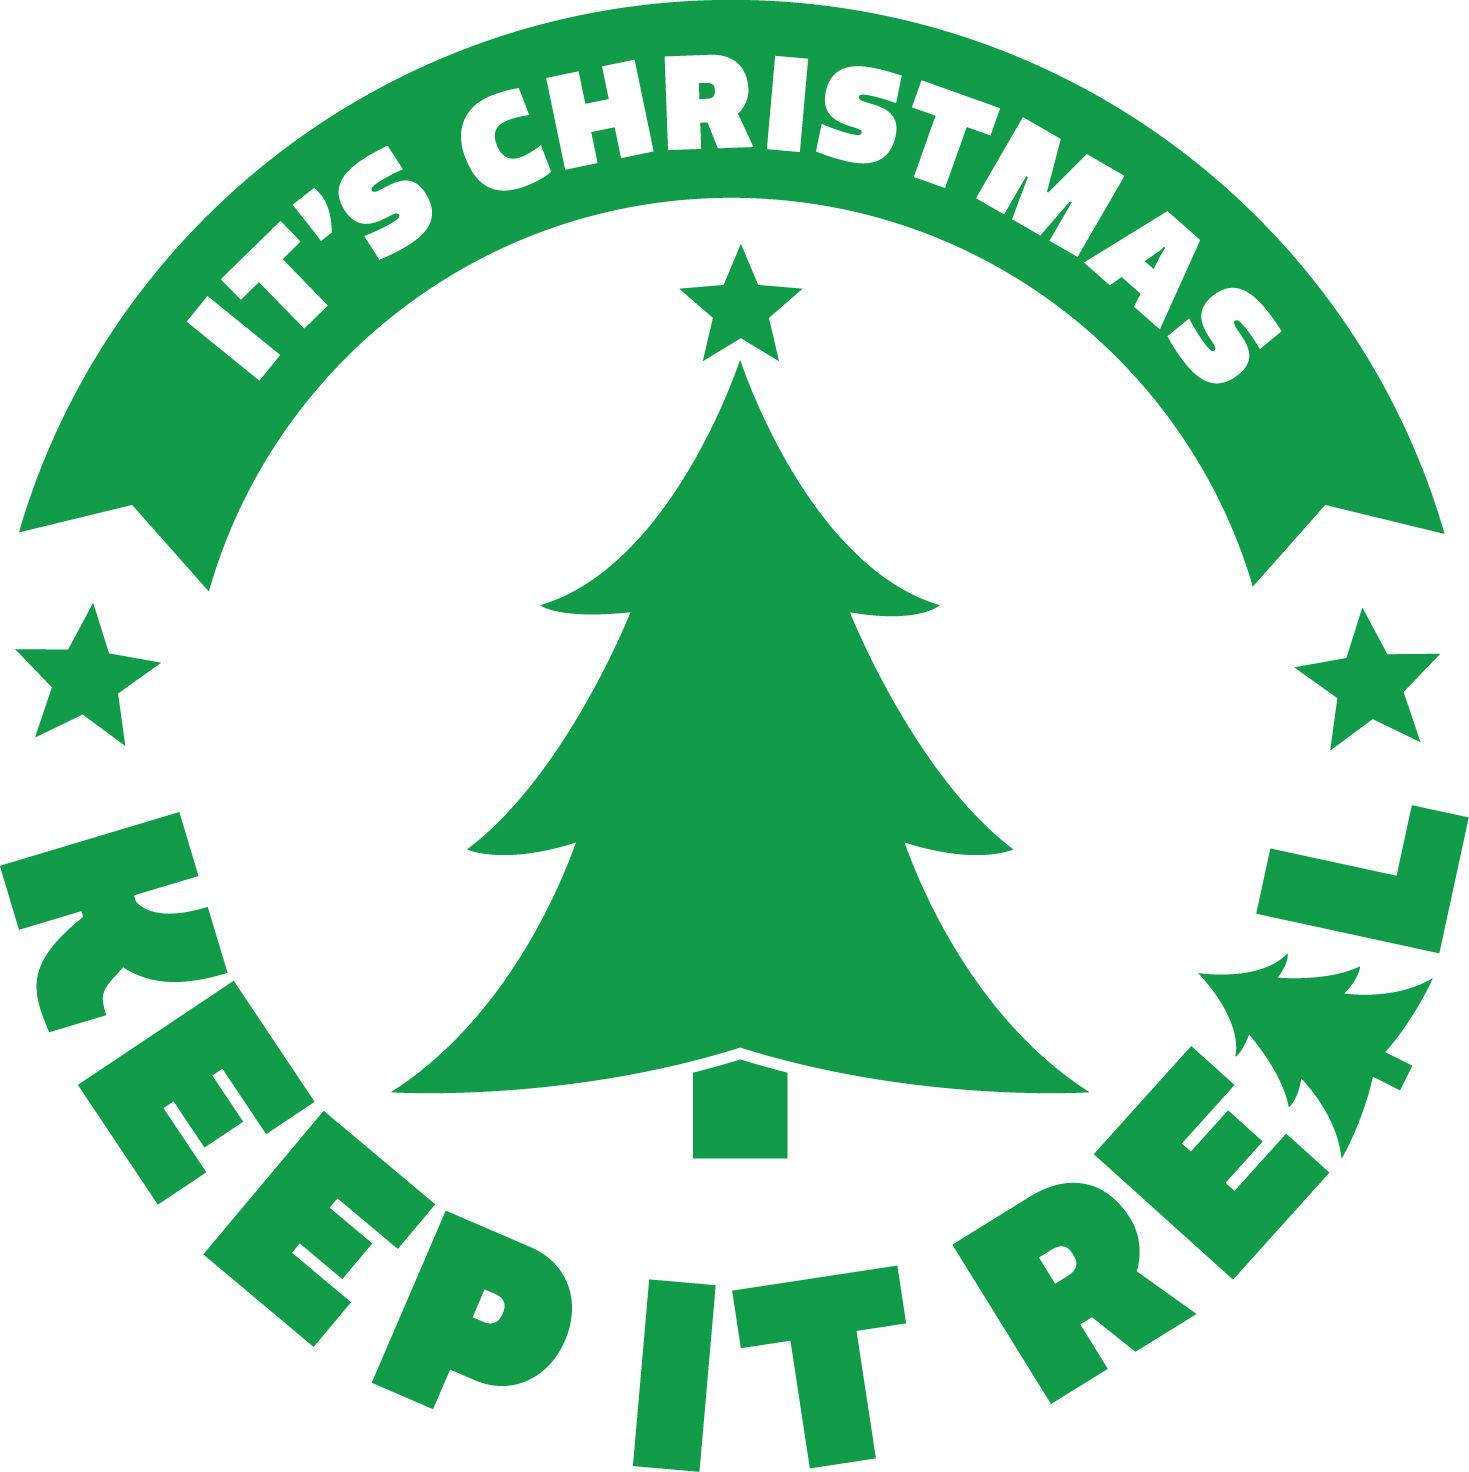 Pin By Acrylics For Crafting On Christmas Decorating Texas Christmas Tree Christmas Tree Farm Fresh Christmas Trees